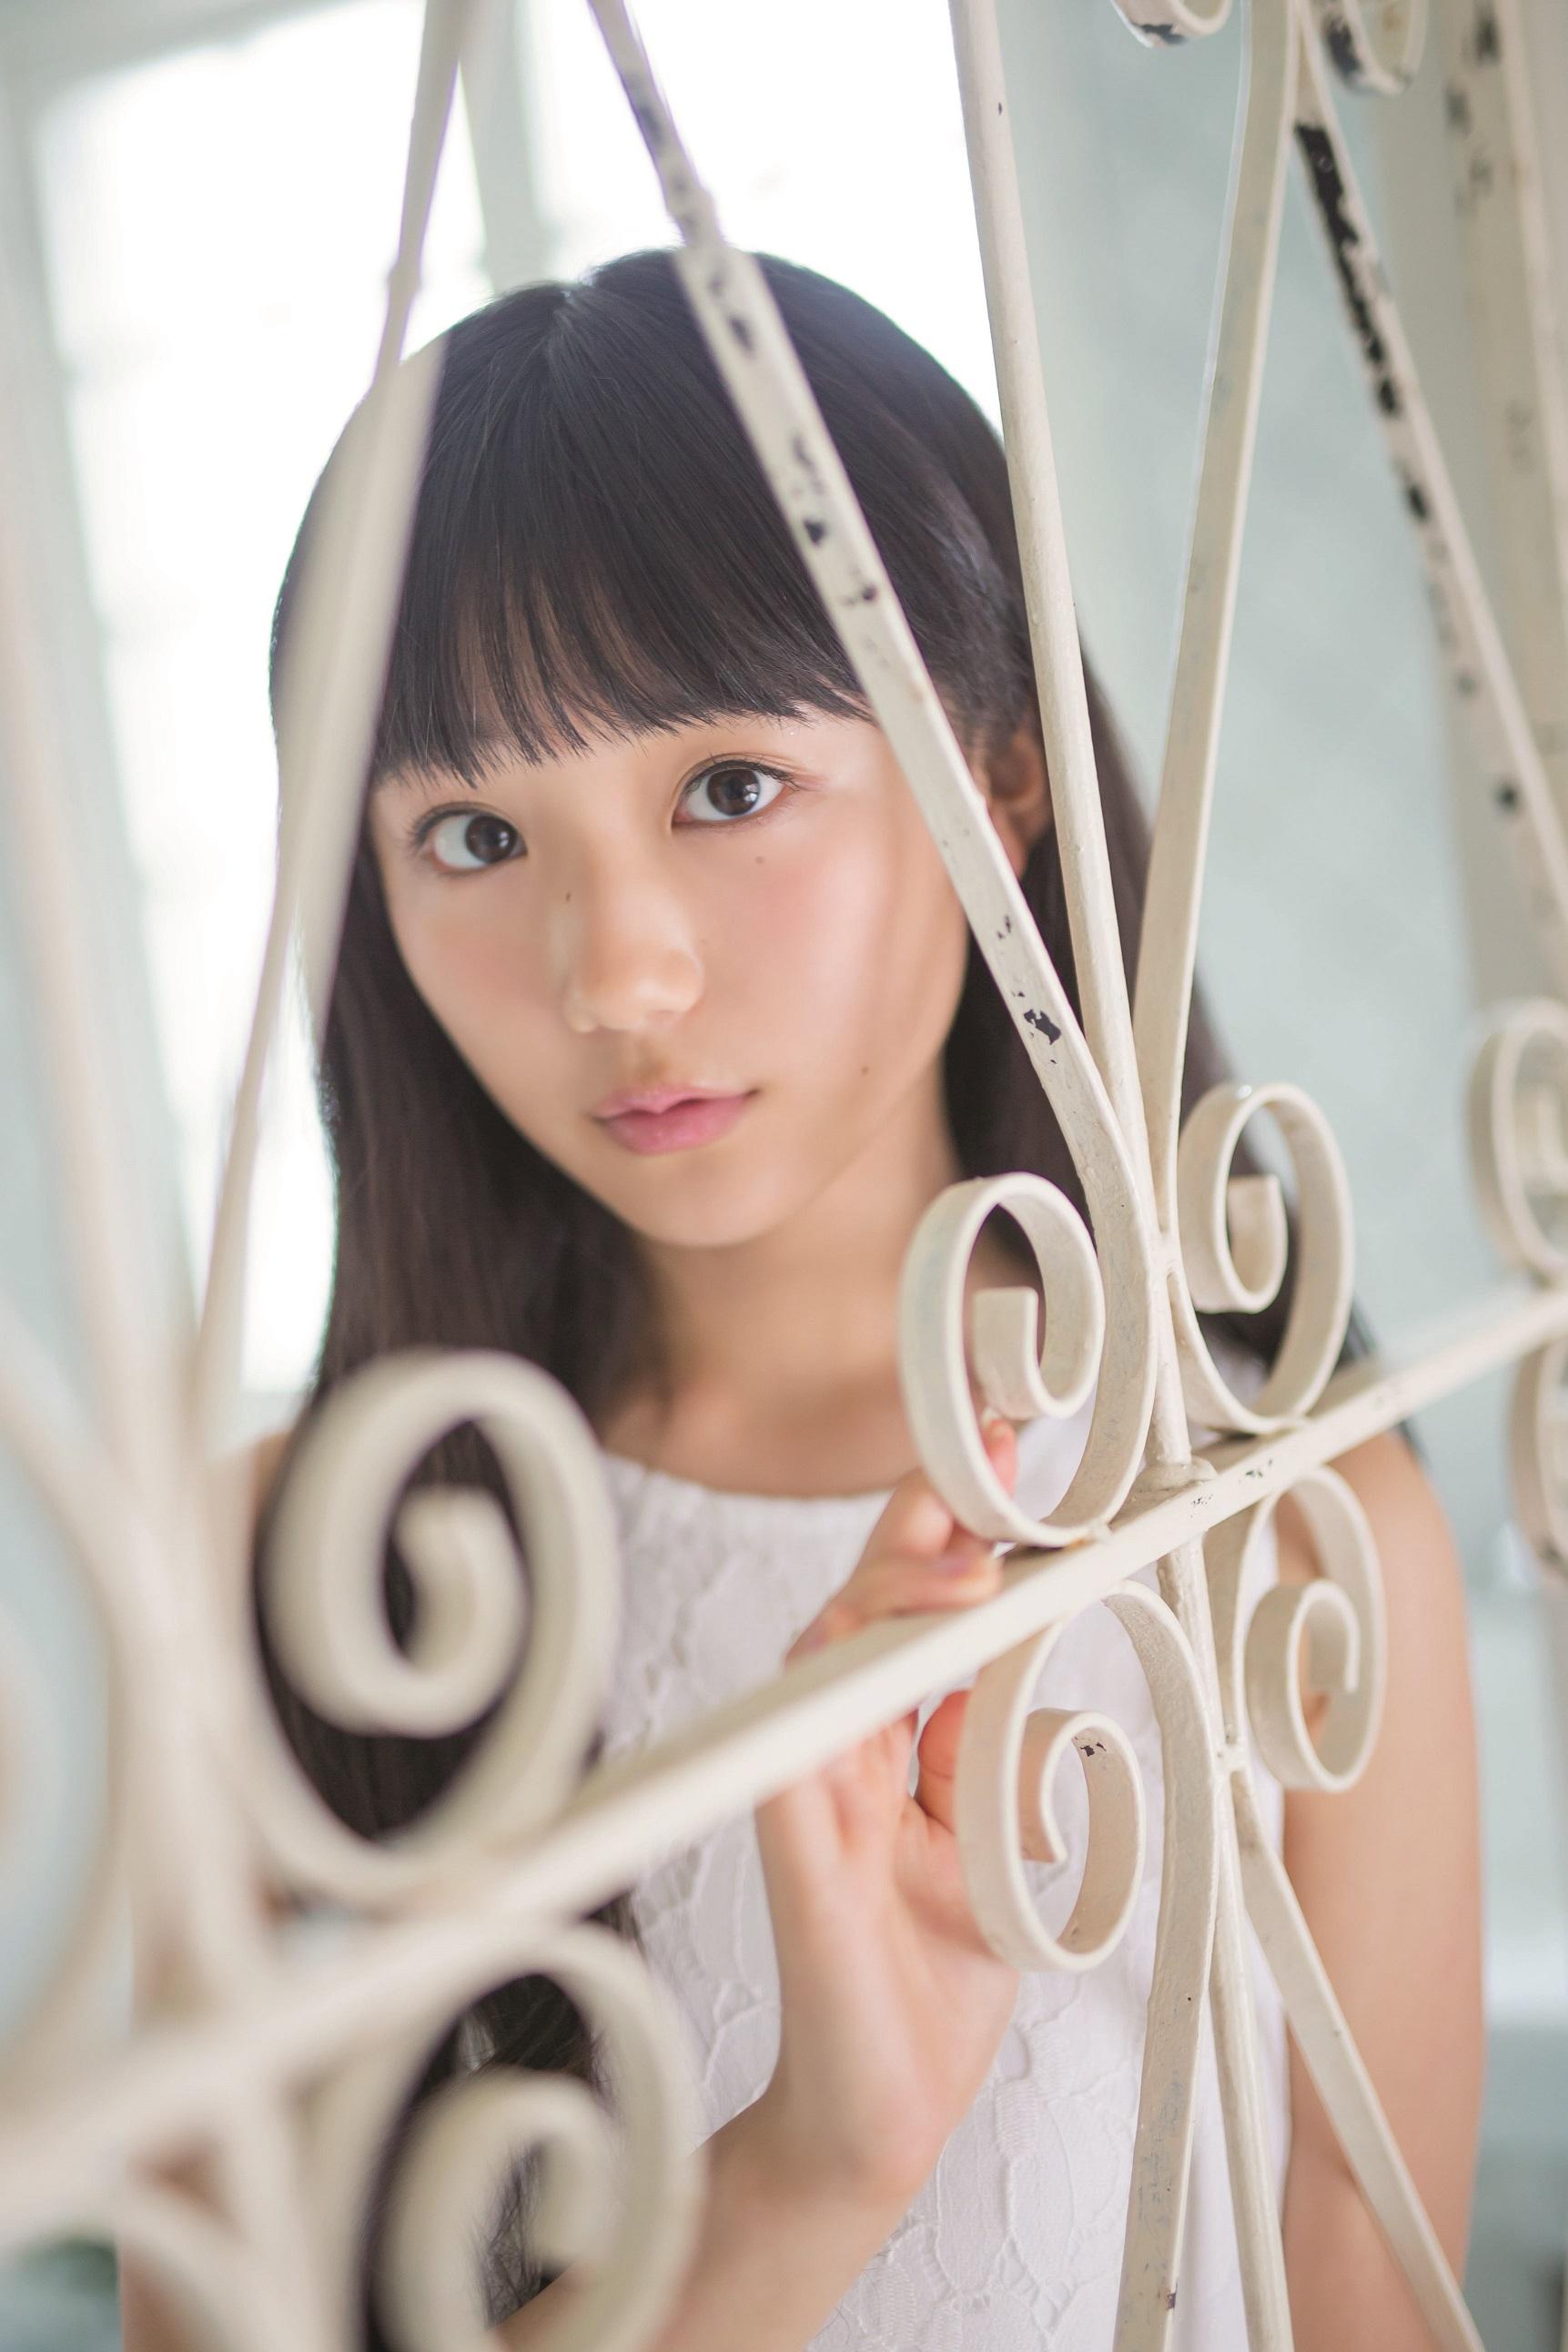 DMA-1DX_5672 SUPER☆GiRLSに、6月25日に新加入した新メンバーの、阿部夢梨